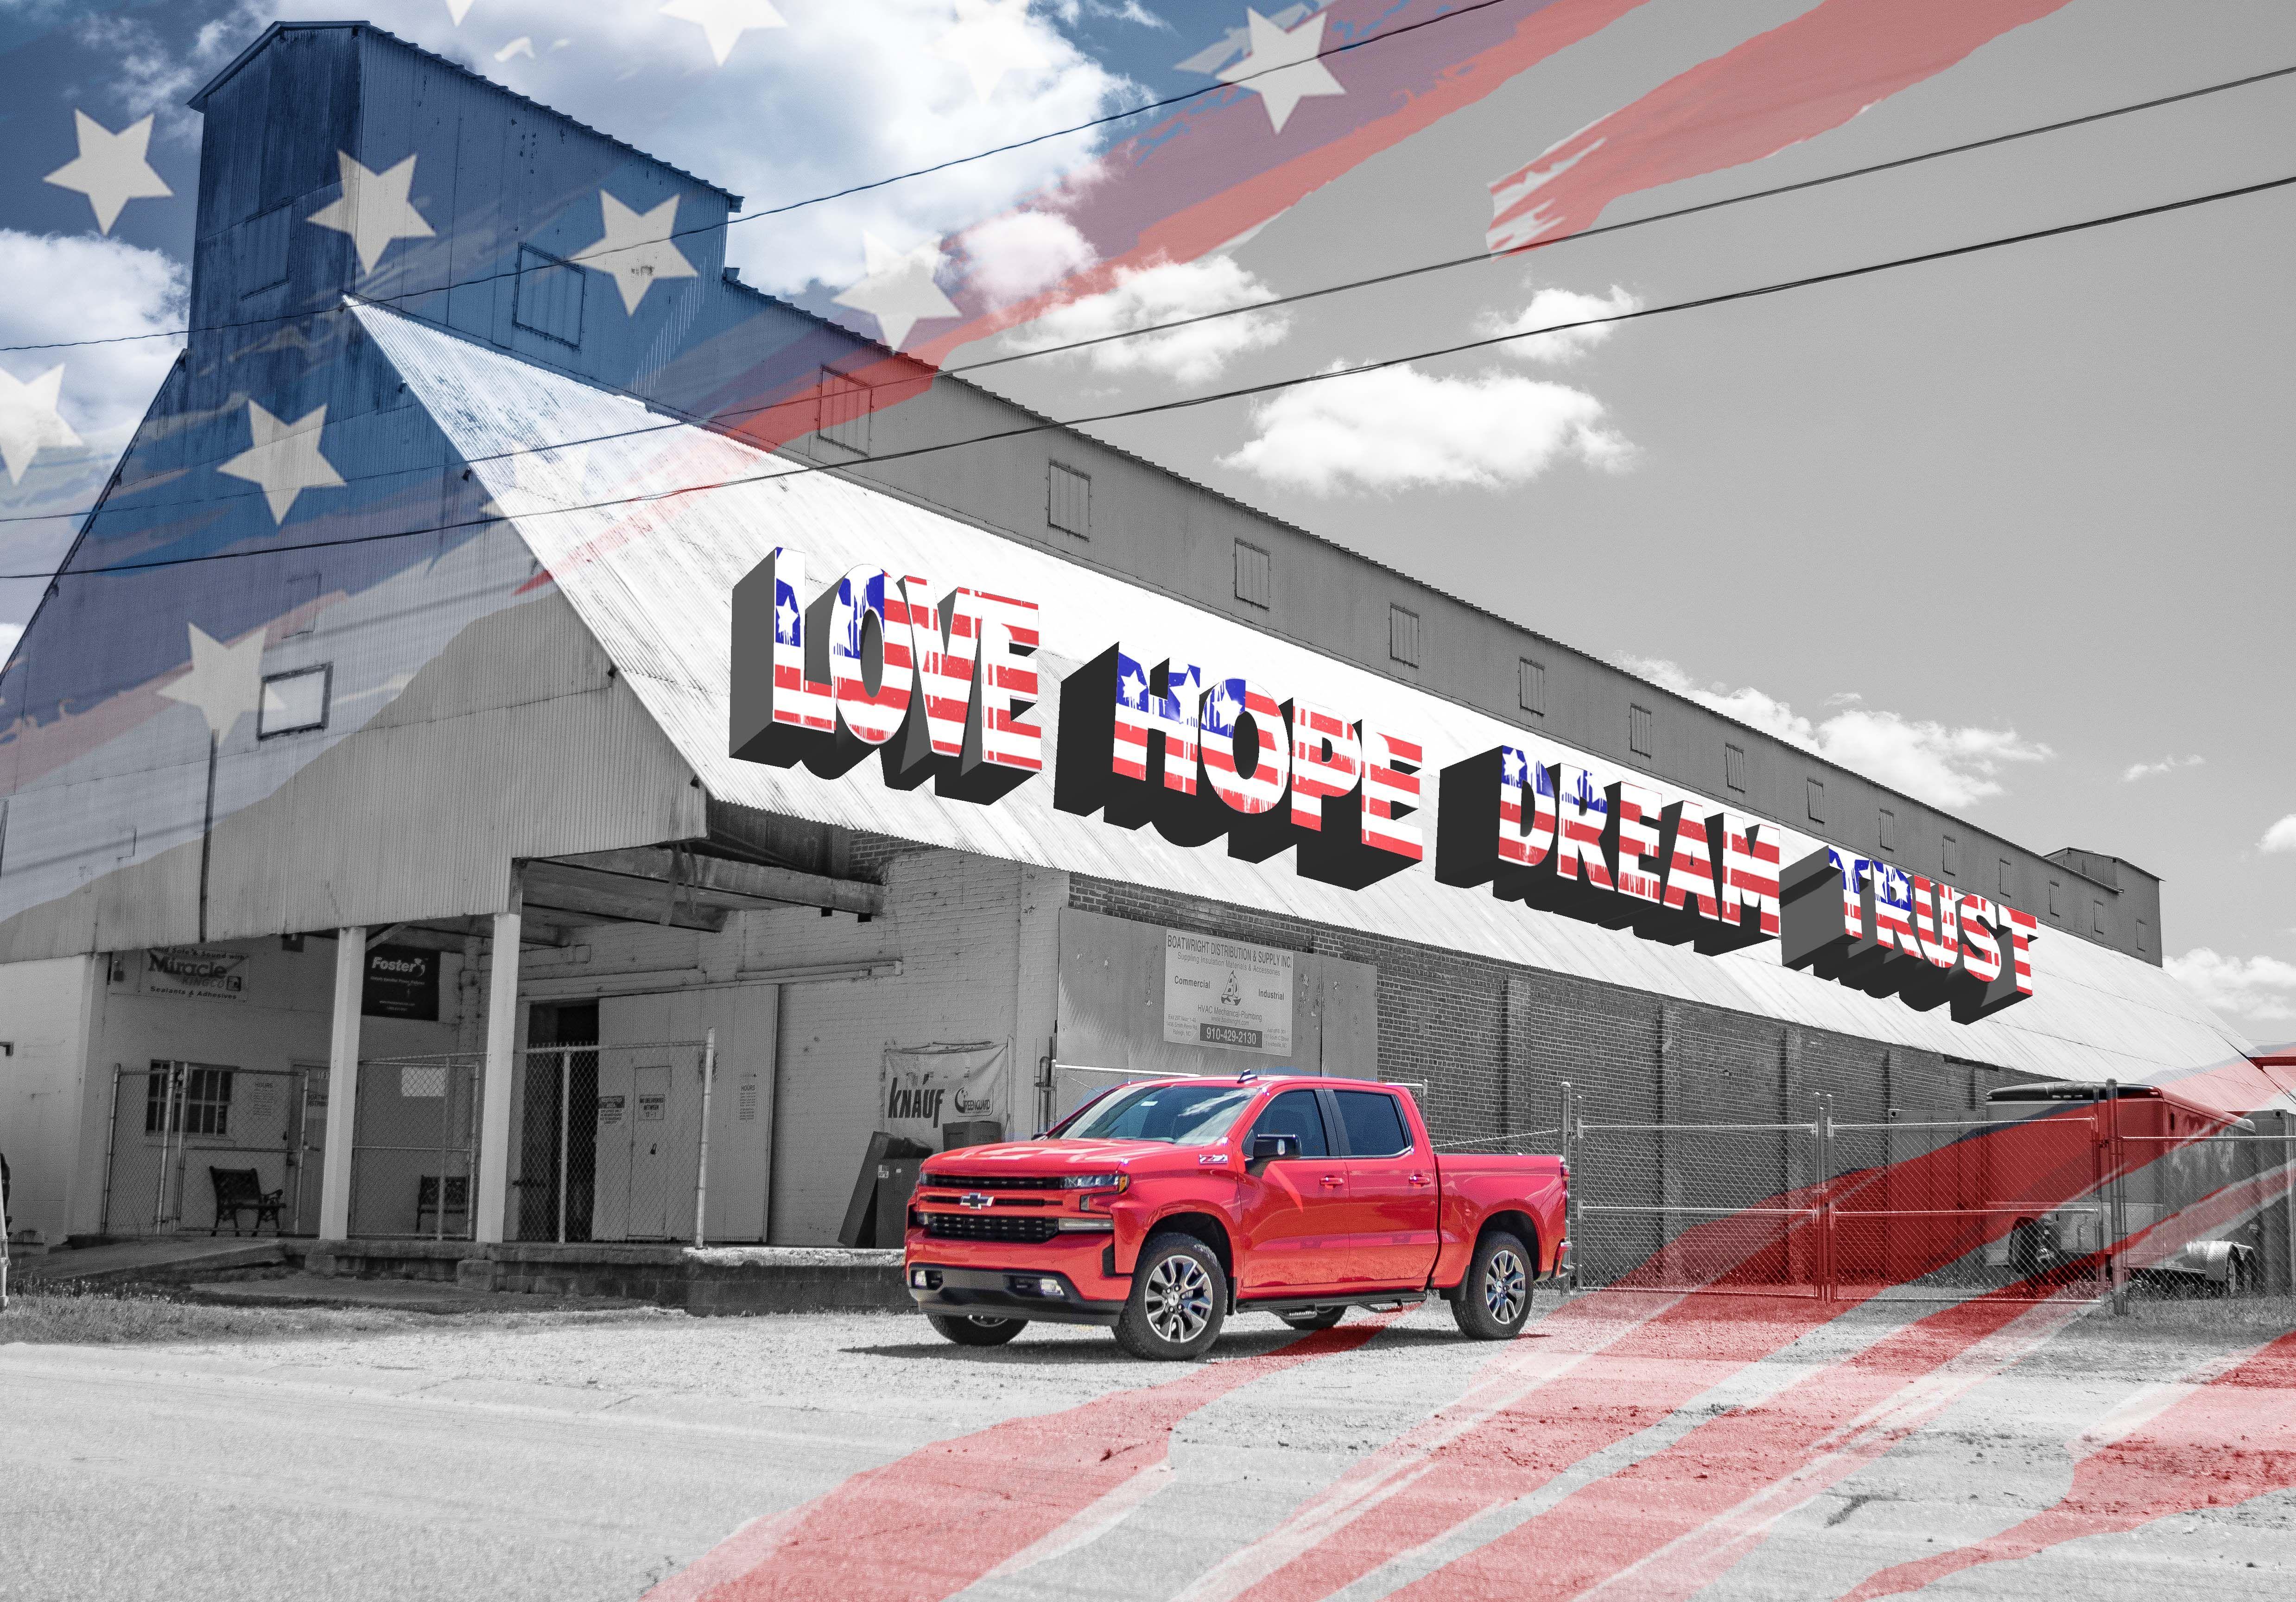 Jeff Gordon Chevrolet >> Happy 4th Of July From Your Jeff Gordon Chevrolet Family